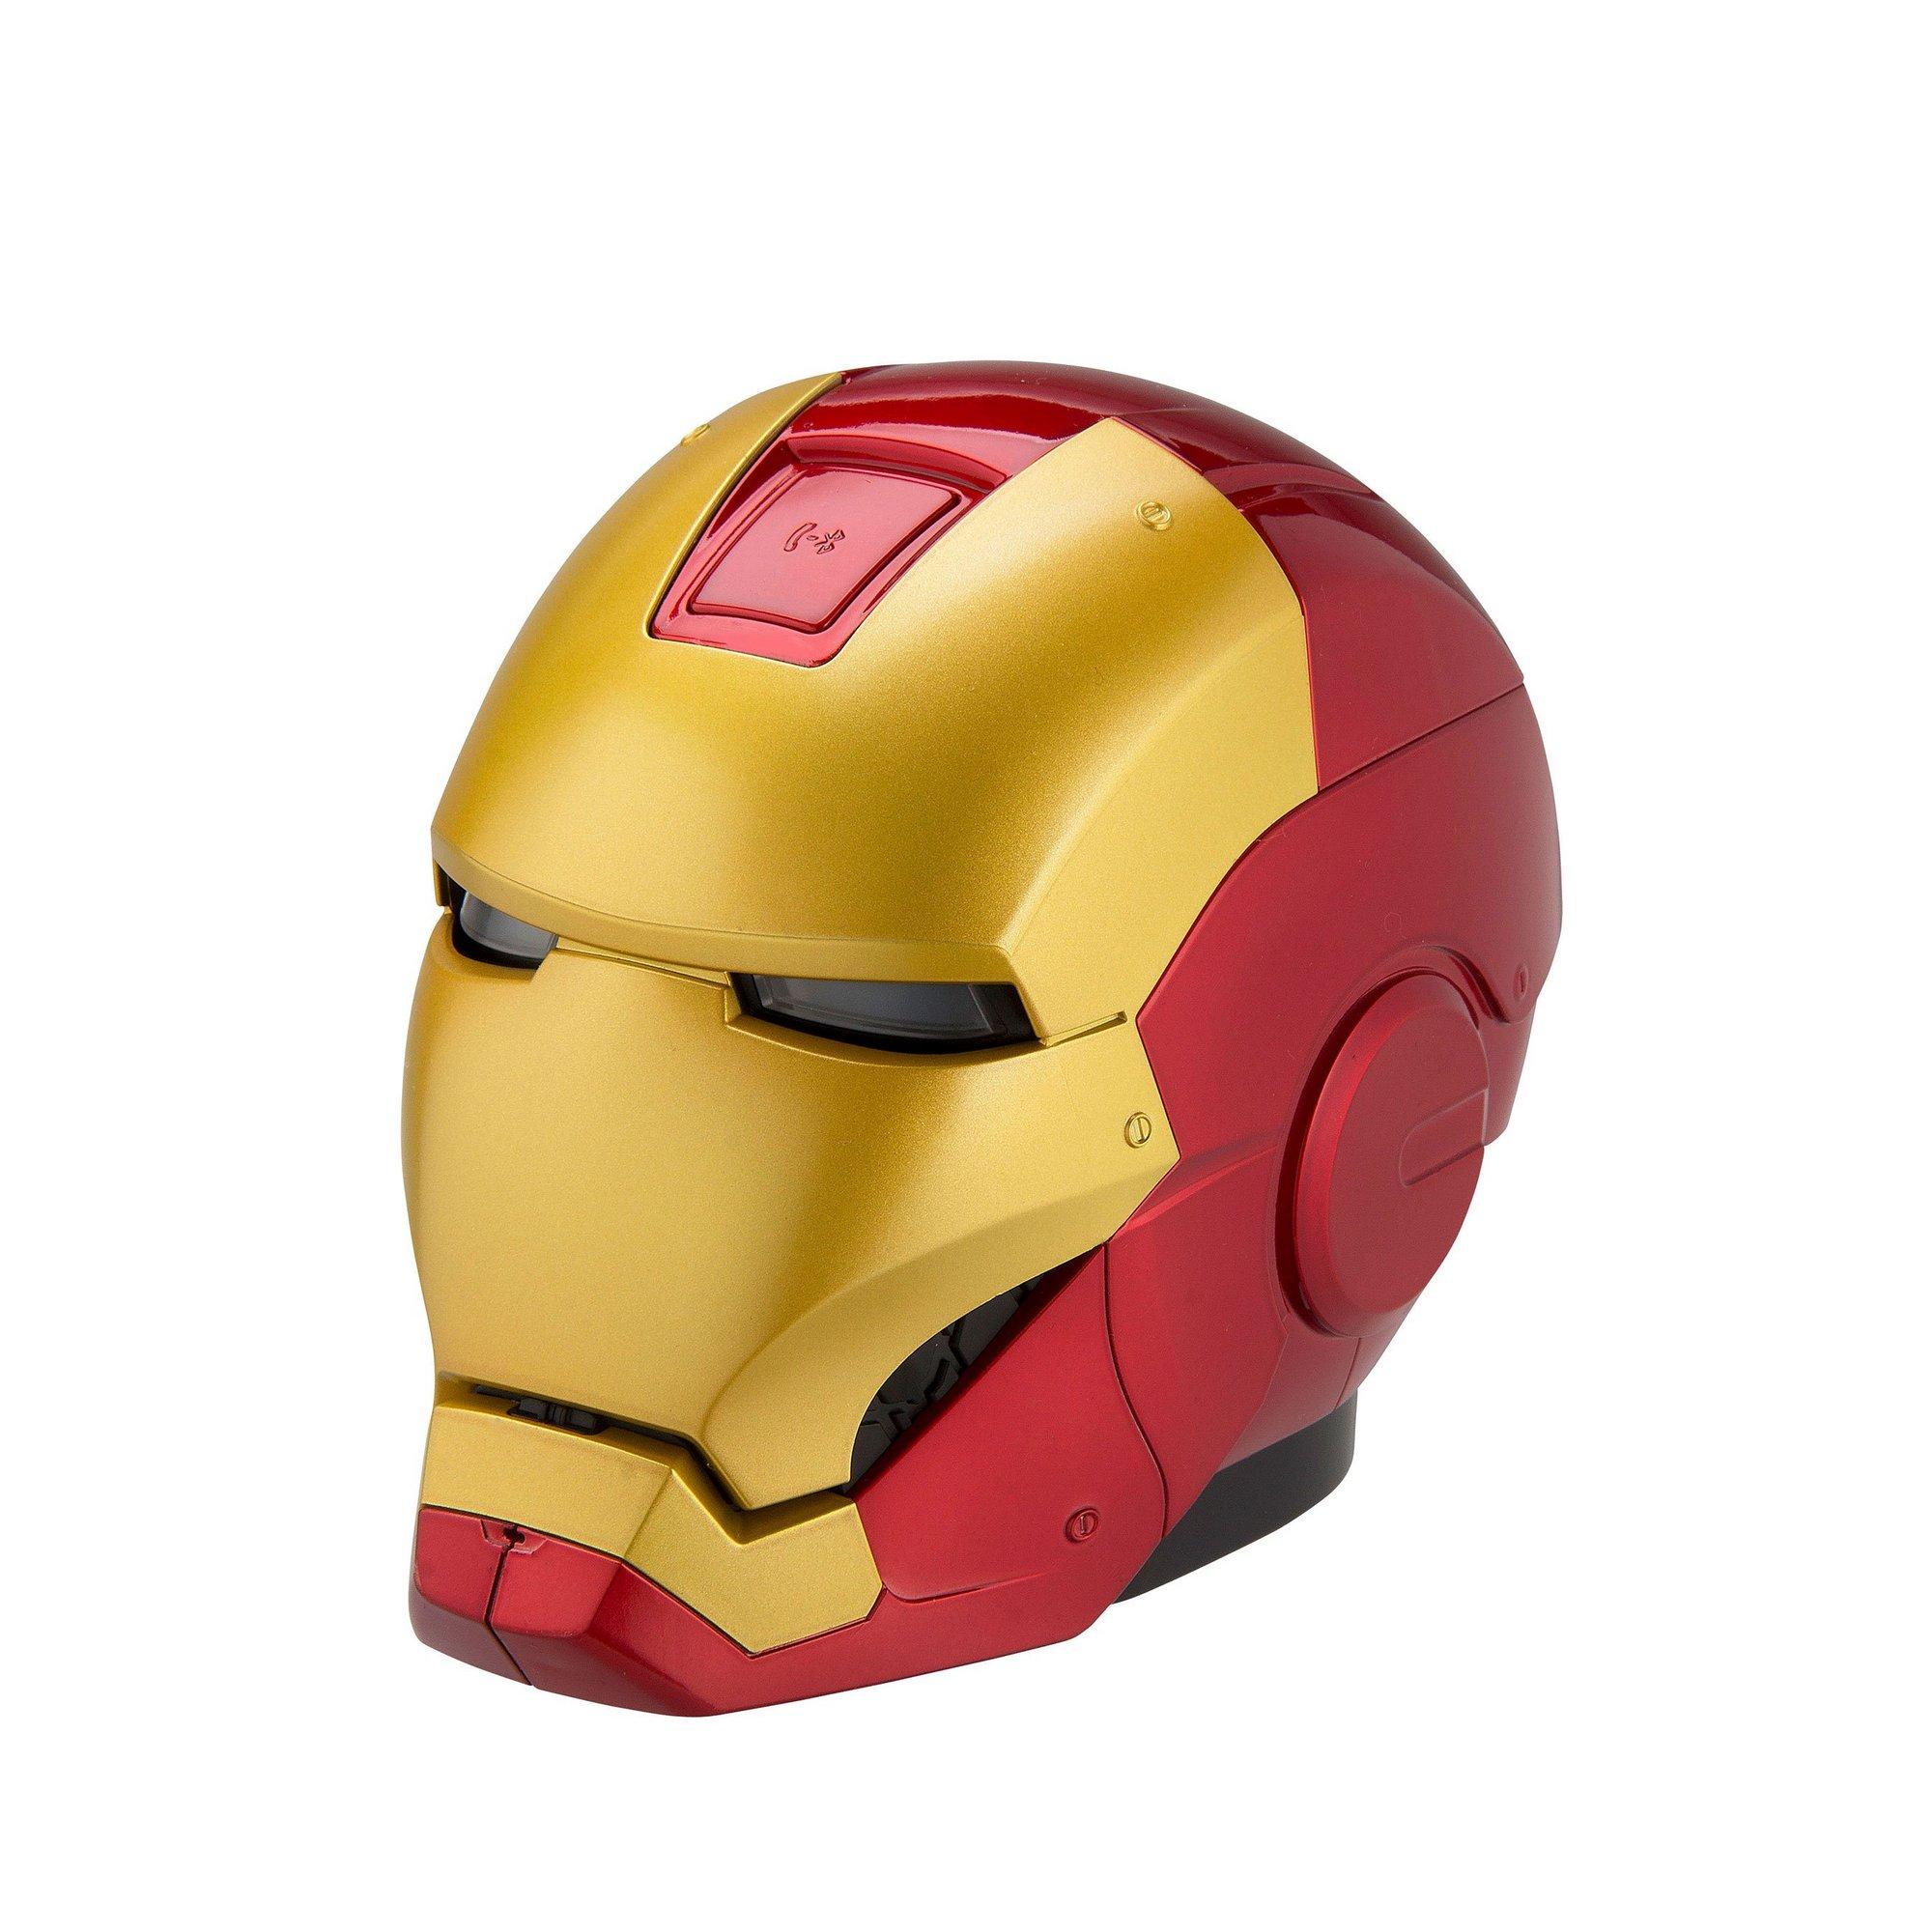 Image of Avengers Assemble Bluetooth Iron Man Helmet Speaker